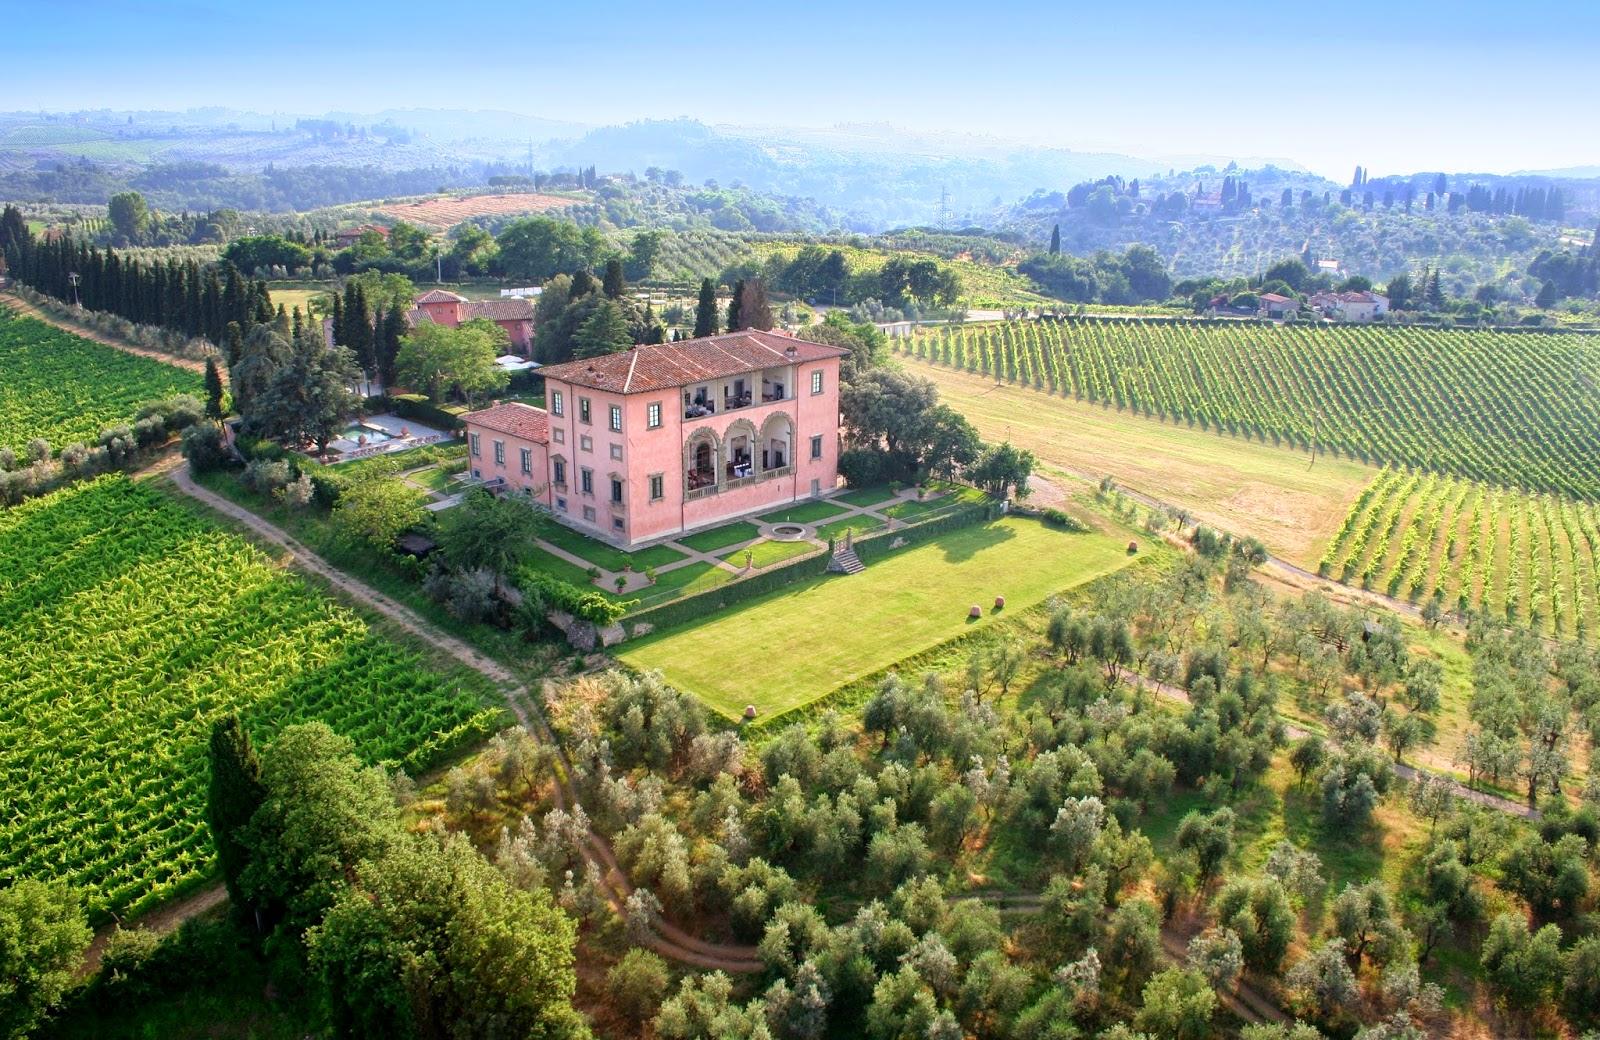 Villa Machiavelli entre las viñas de la Toscana italiana - Foto: TripAdvisor Vacation Rentals